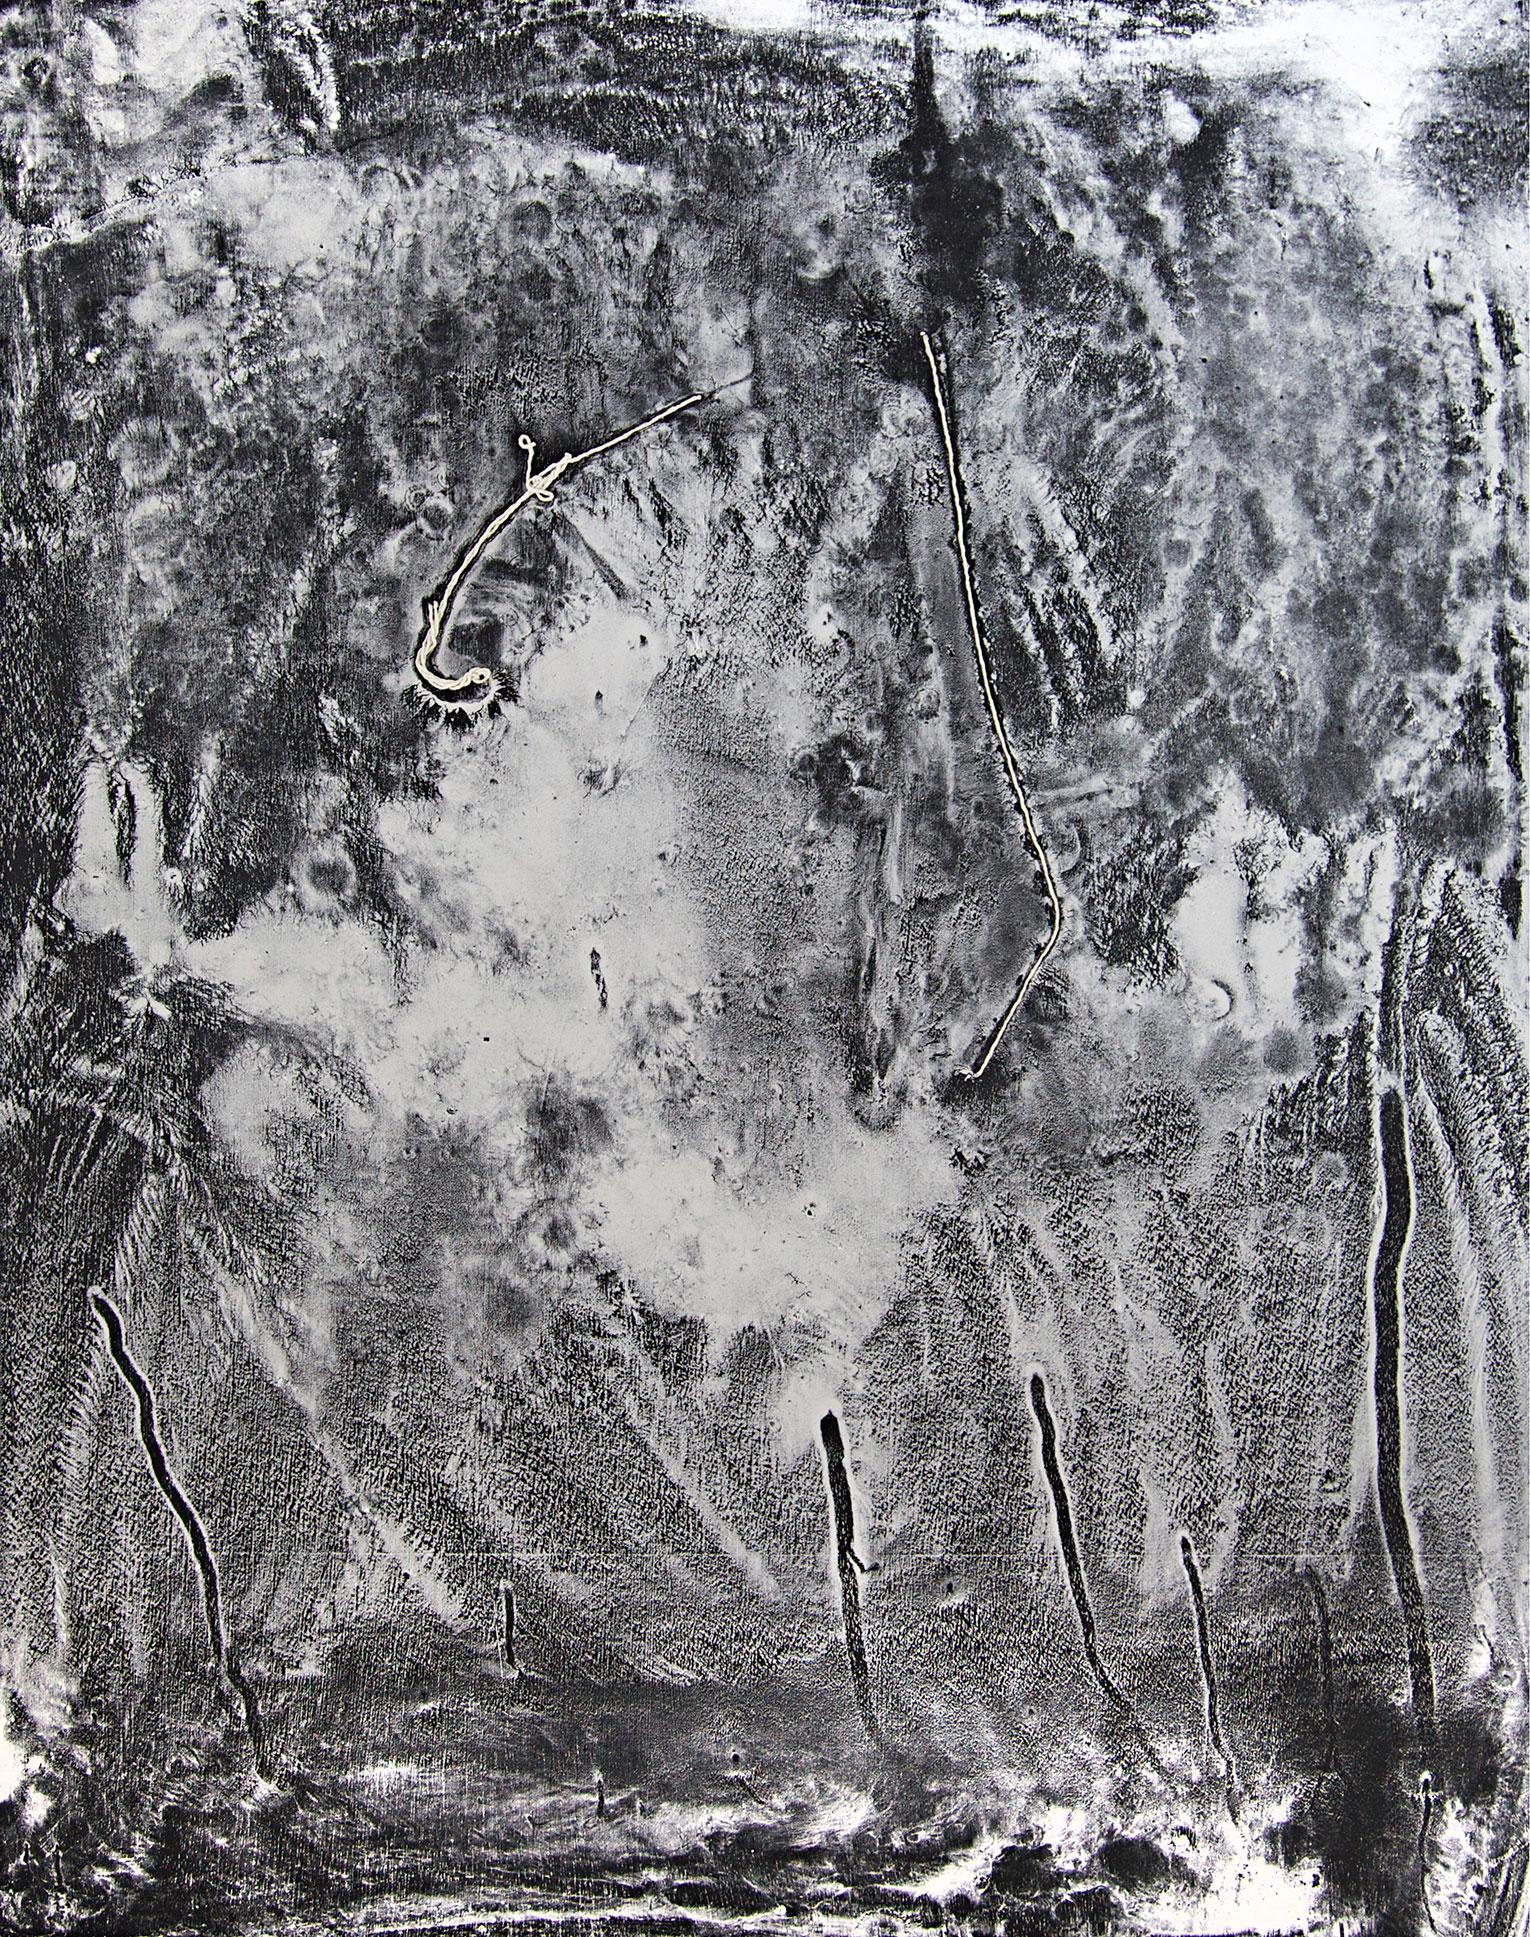 <b>Title:</b>Fools Excellent Behoved<br /><b>Year:</b>2014<br /><b>Medium:</b>Chalk and string on painted board<br /><b>Size:</b>61 x 47.5 x 1.8 cm